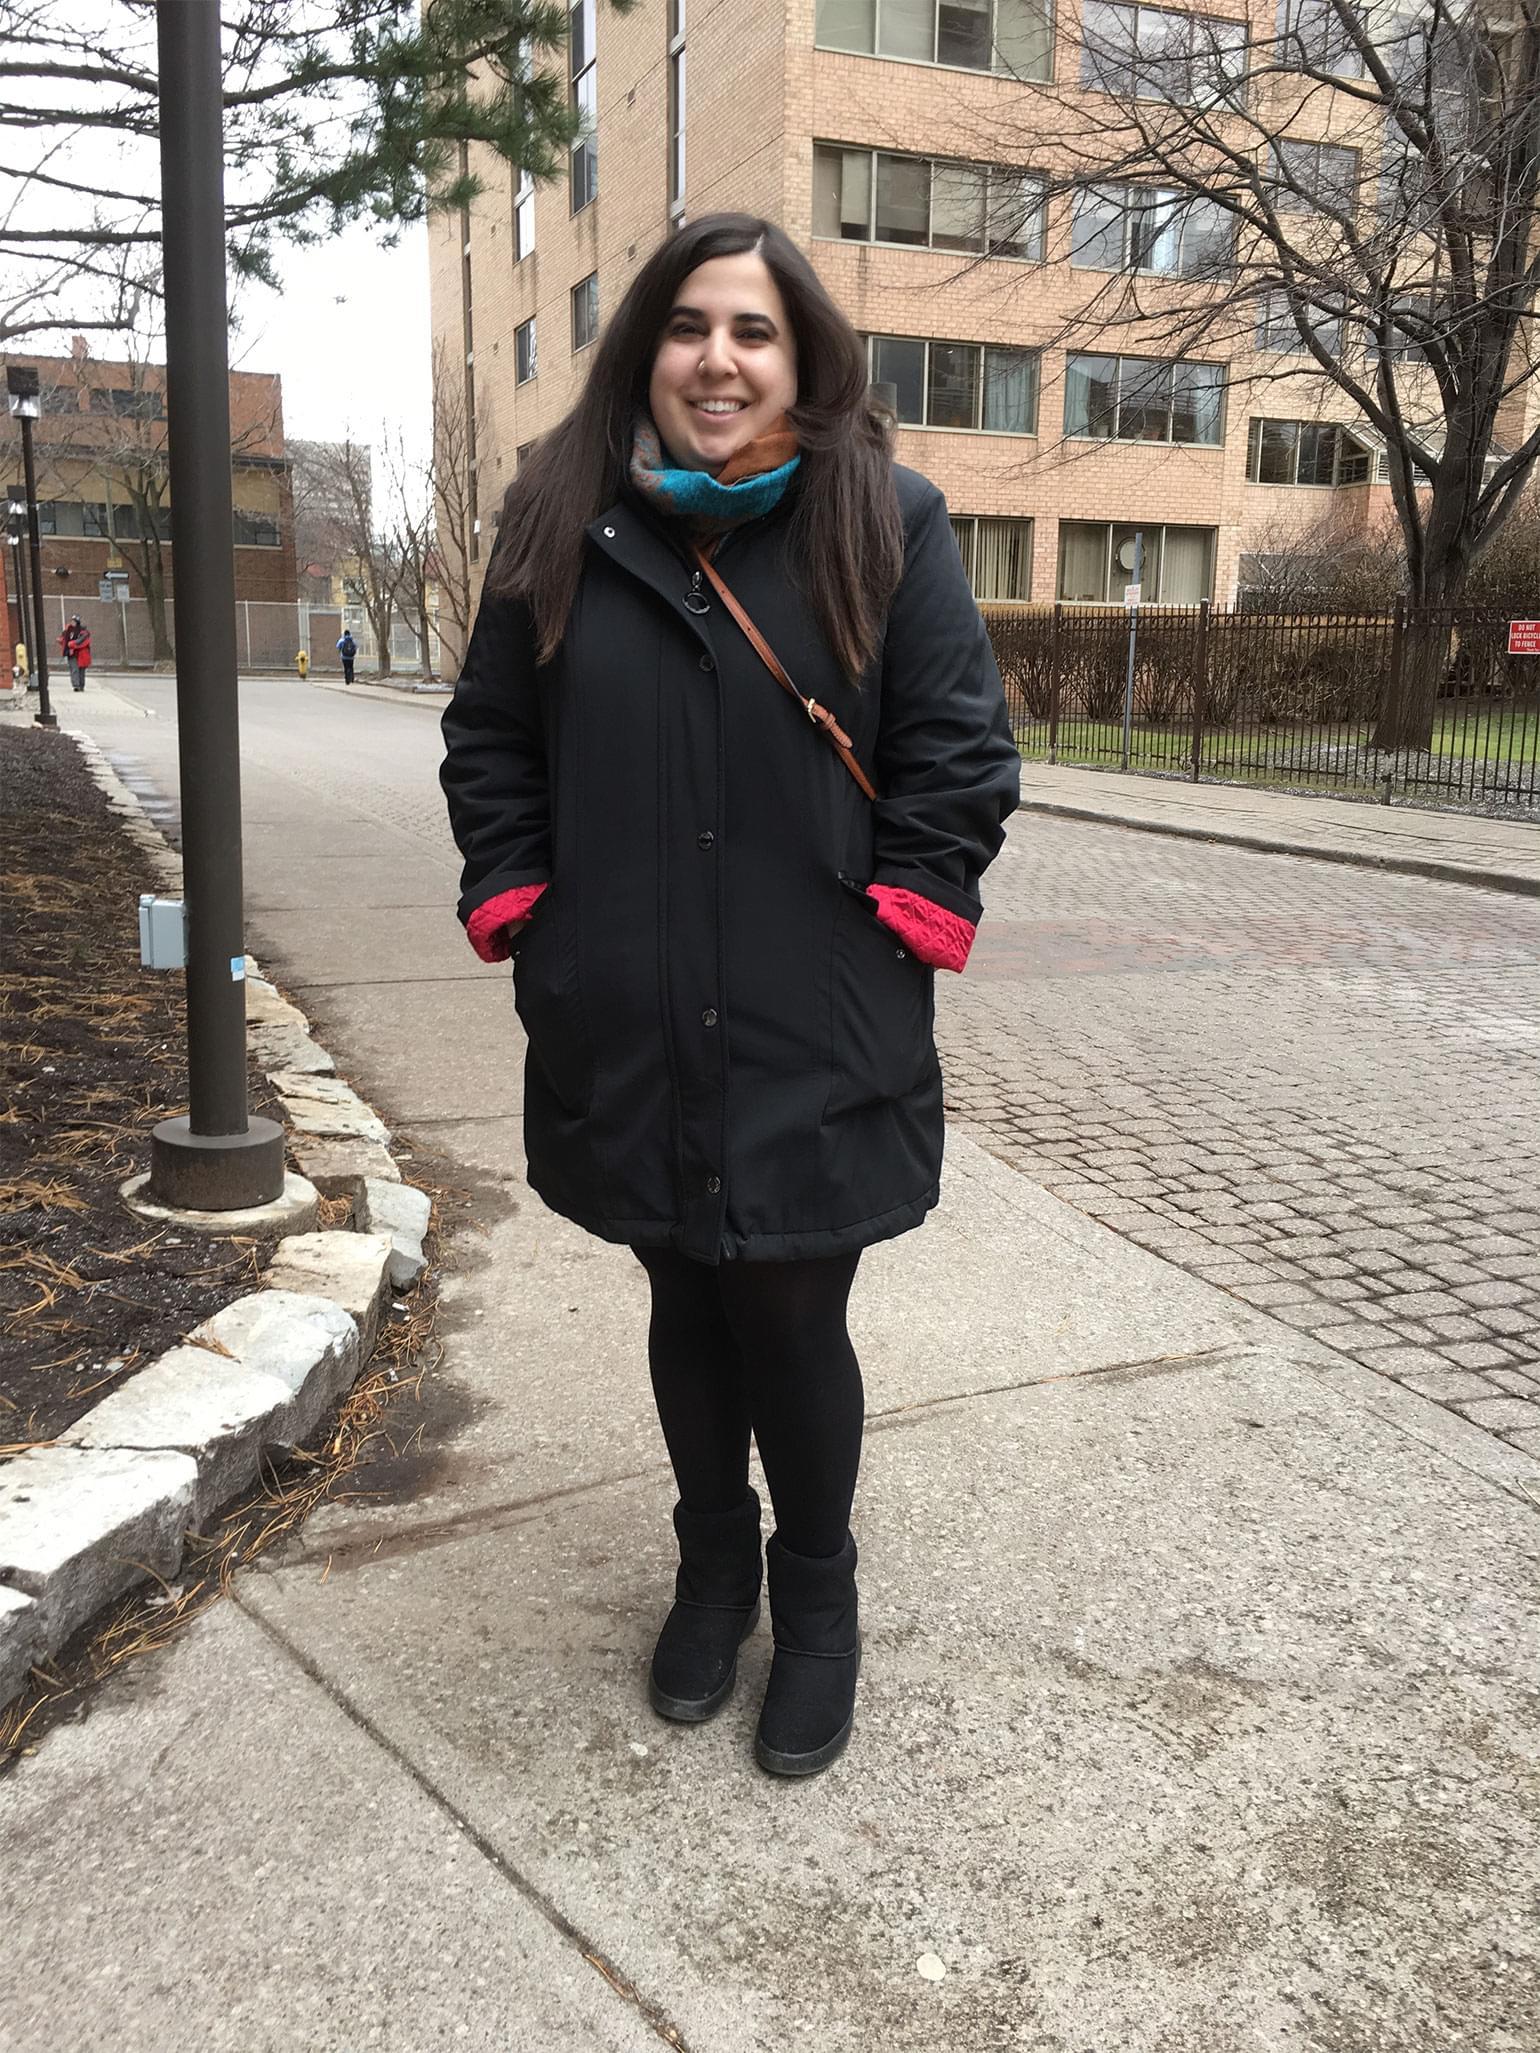 Deborah, Western University; Media, Information & Technoculture, 2014